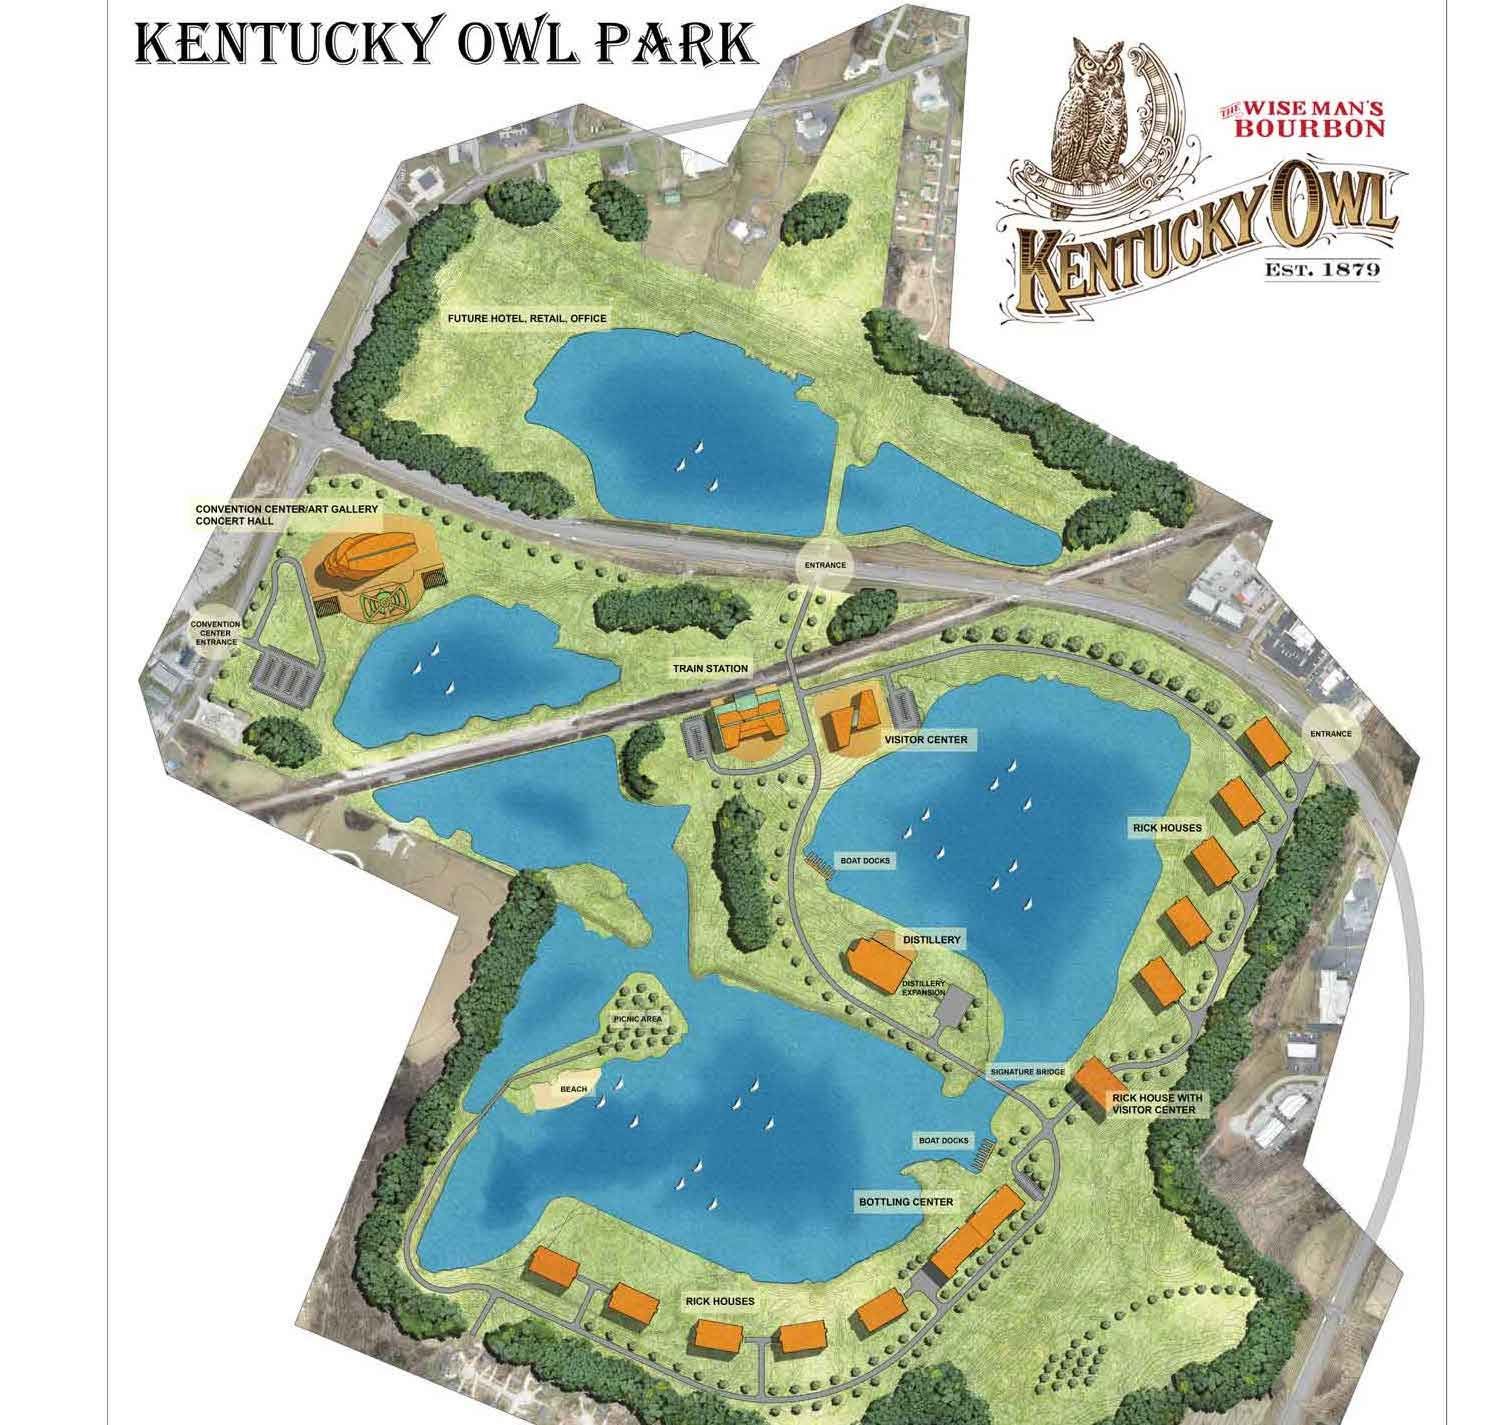 Kentucky Owl Park